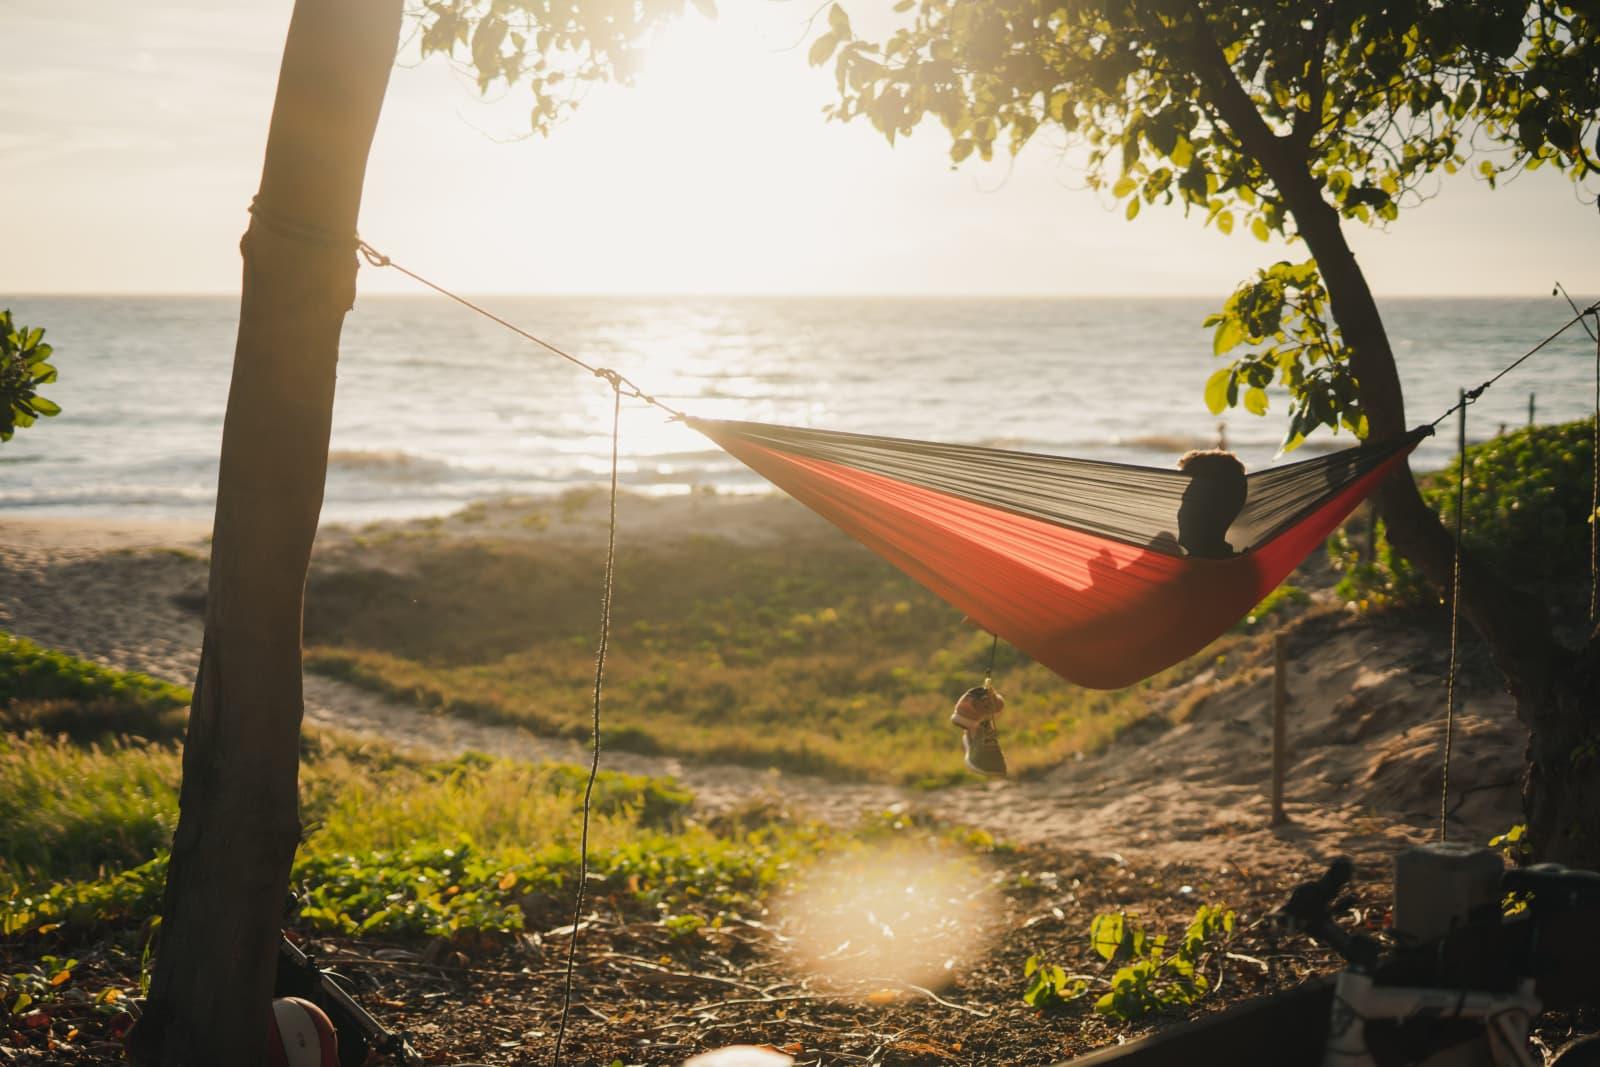 Relaxing In Hammock Watching Sunset